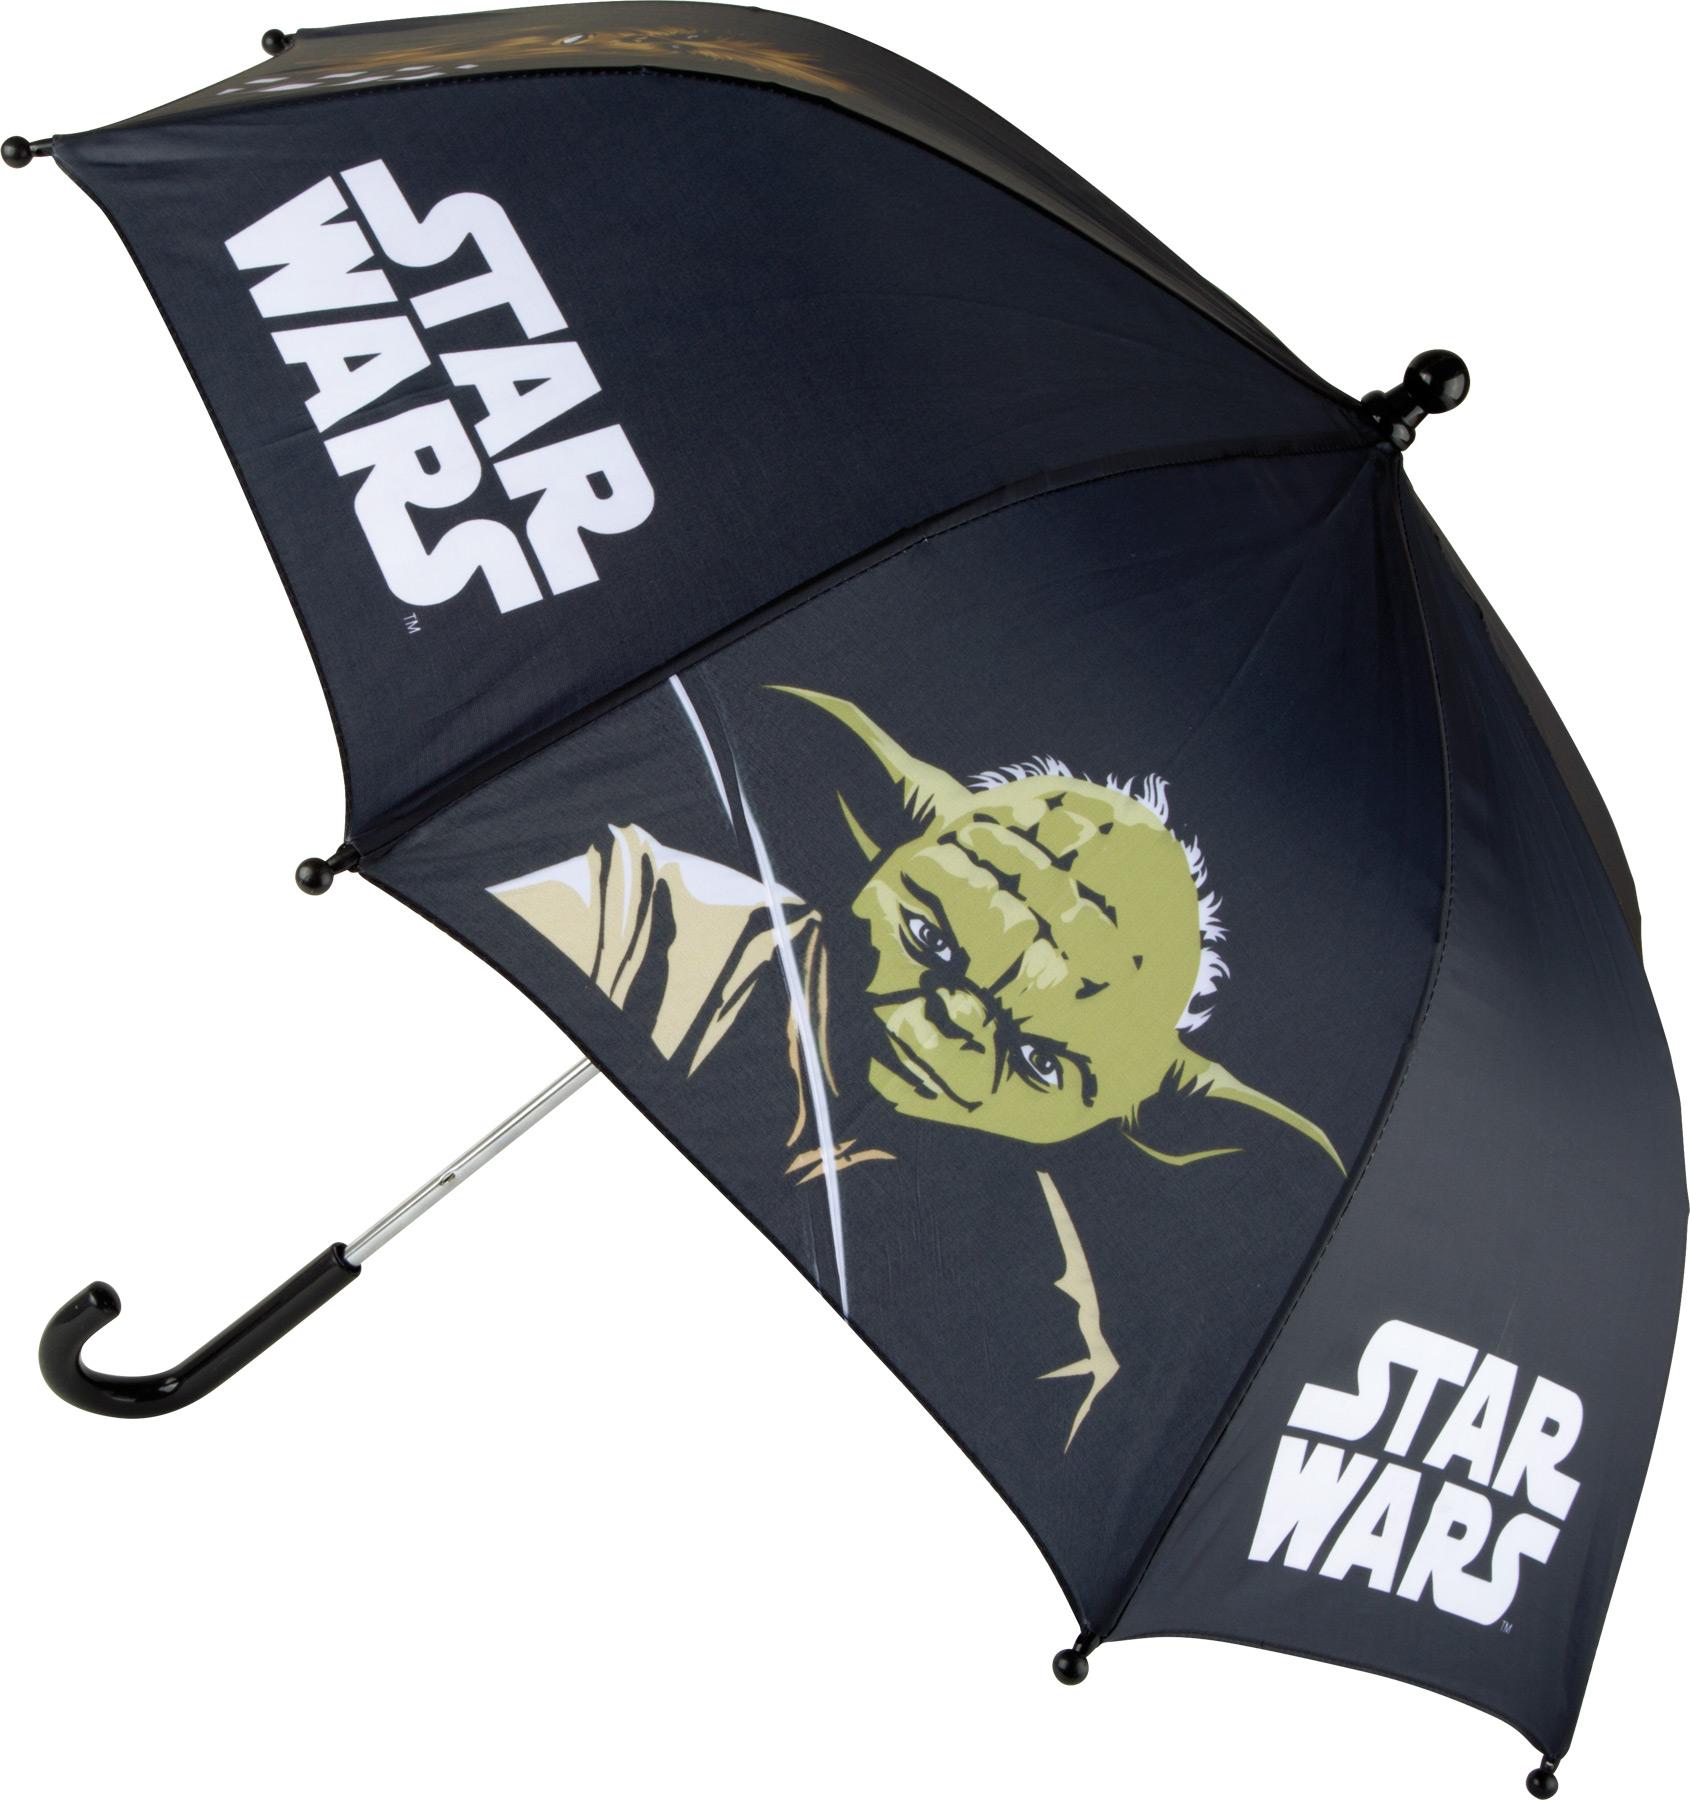 Small Foot Deštník Star Wars černý